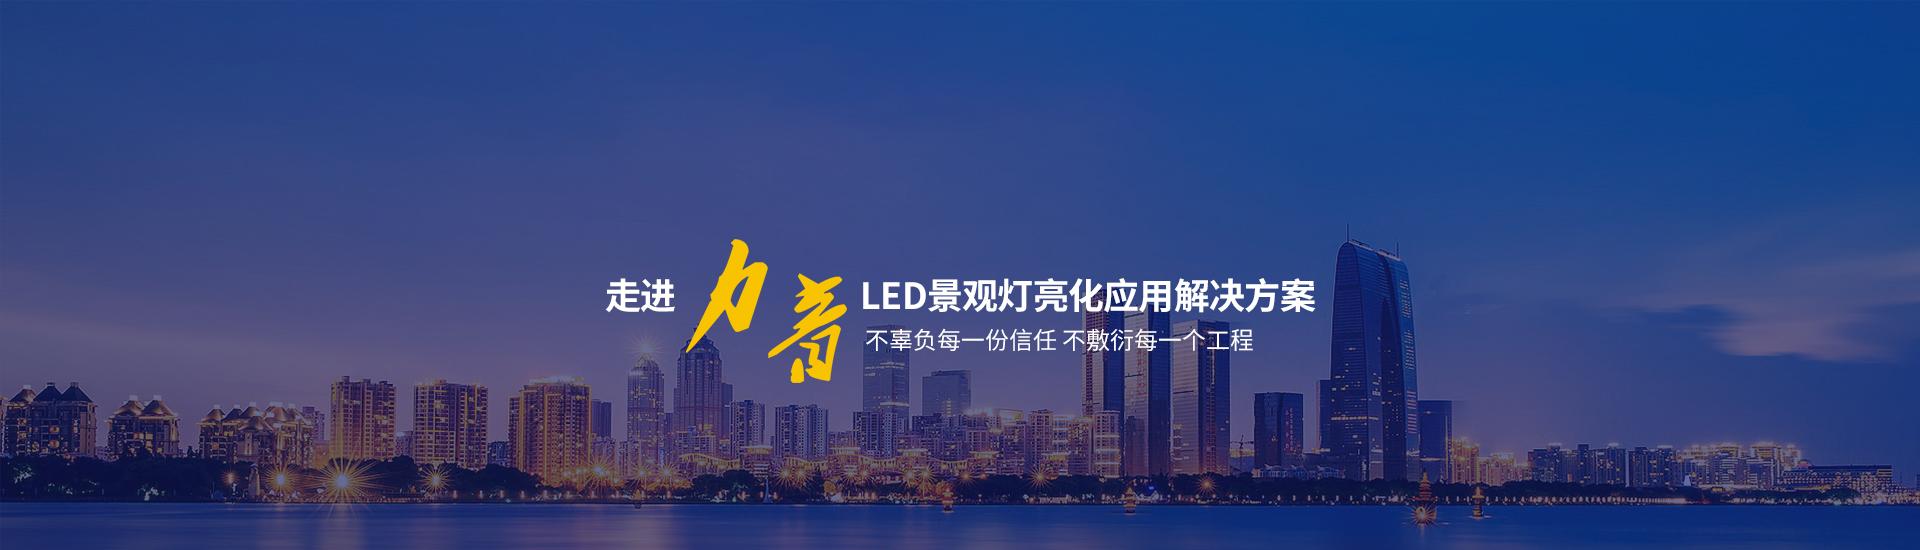 LED洗墻燈,LED線條燈,LED投光燈